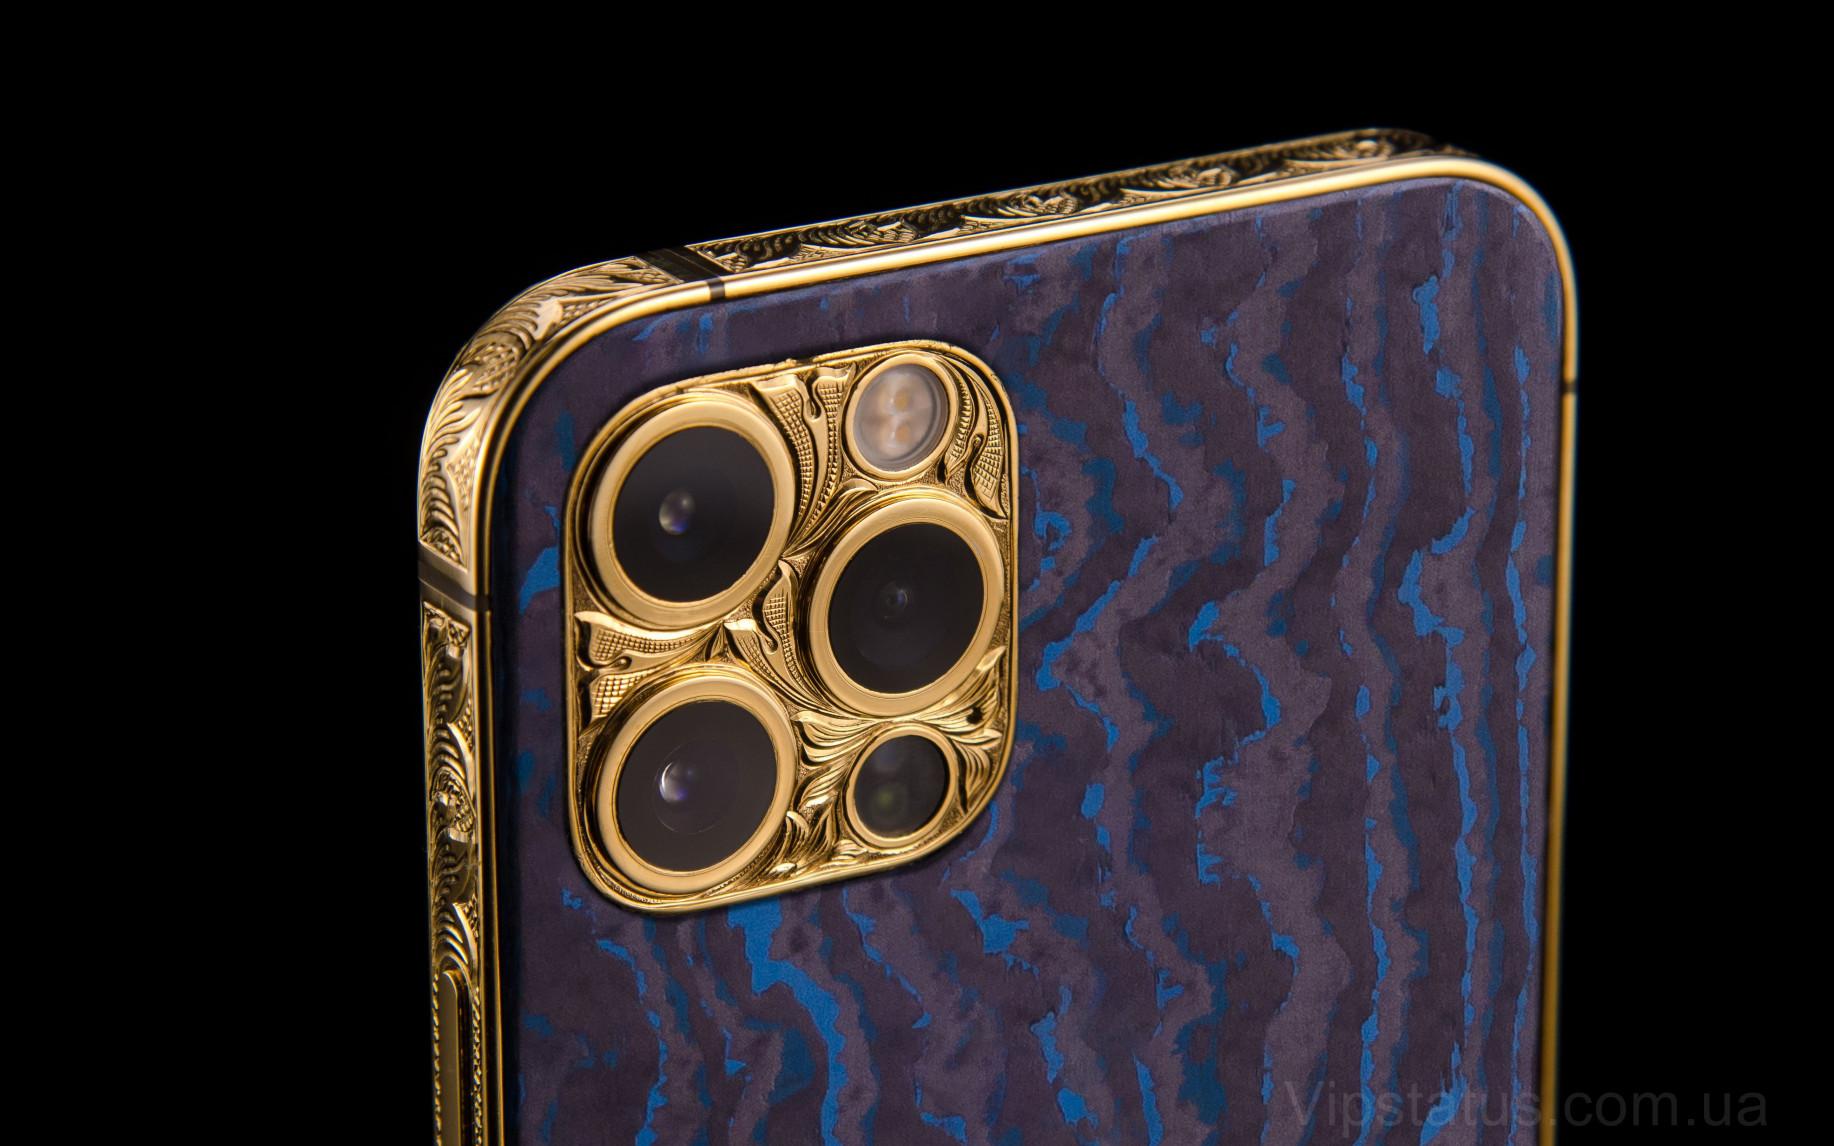 Elite Blue Dream Gold IPHONE 12 PRO MAX 512 GB Blue Dream Gold IPHONE 12 PRO MAX 512 GB image 3